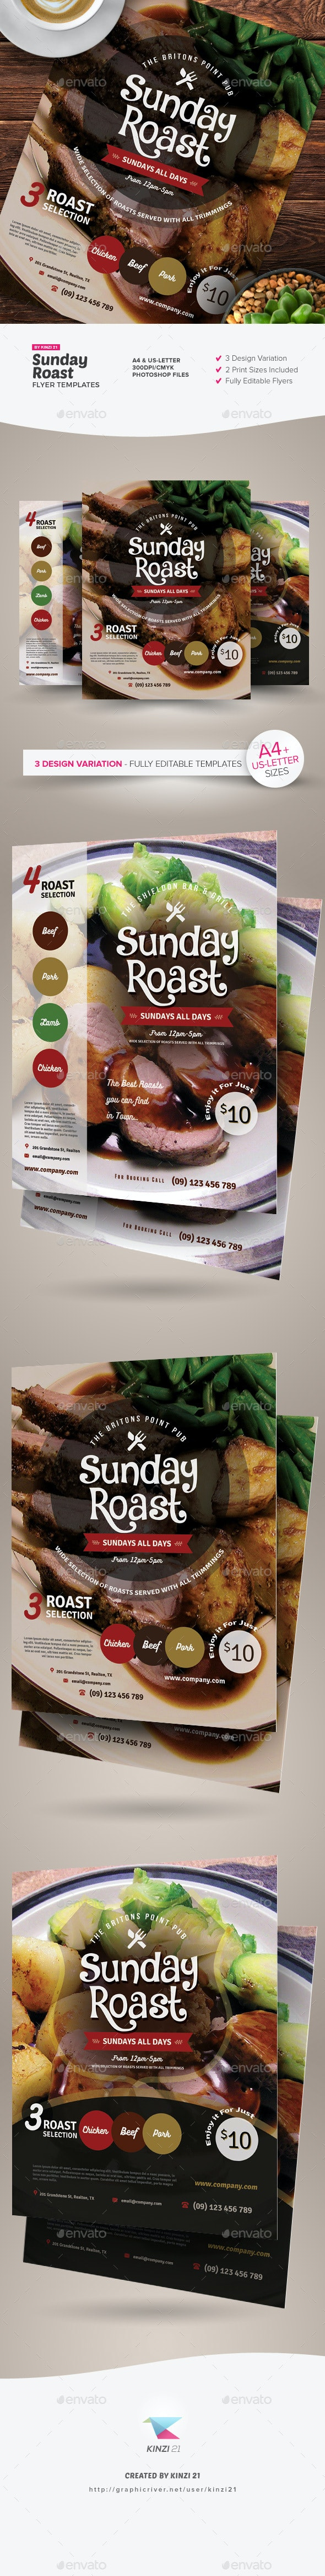 Sunday Roast Flyer Templates - Restaurant Flyers